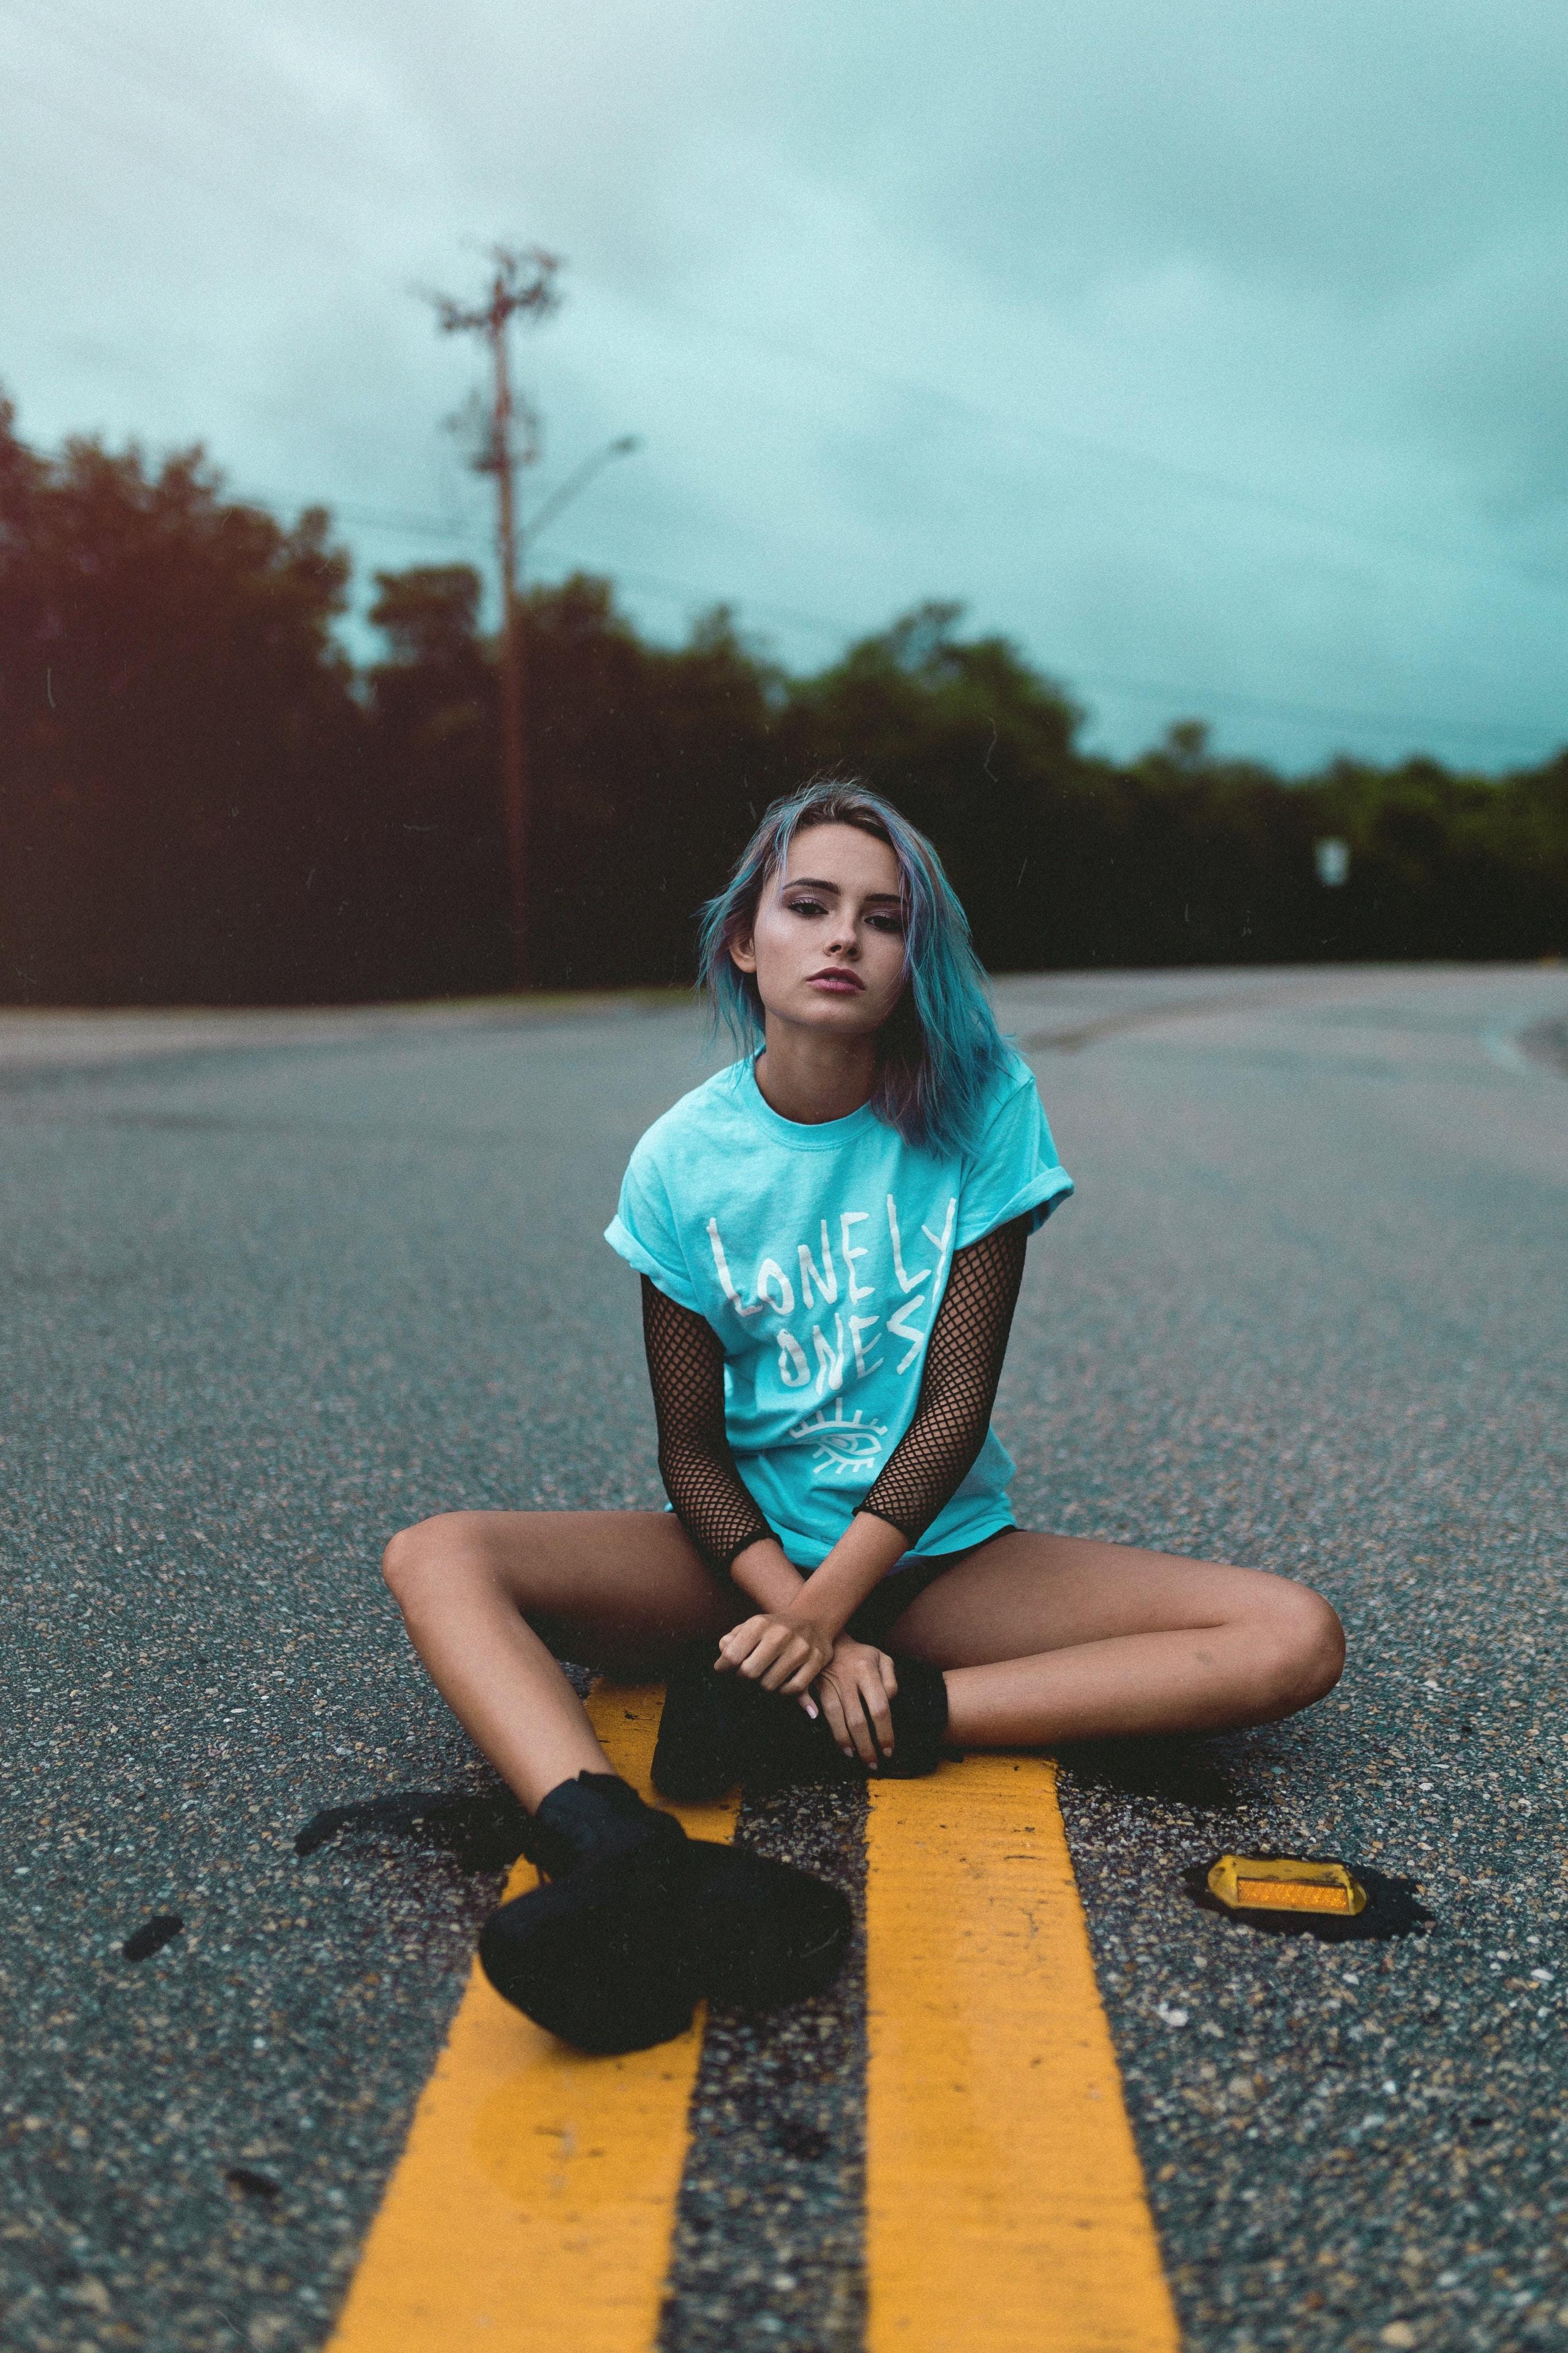 woman sitting on road